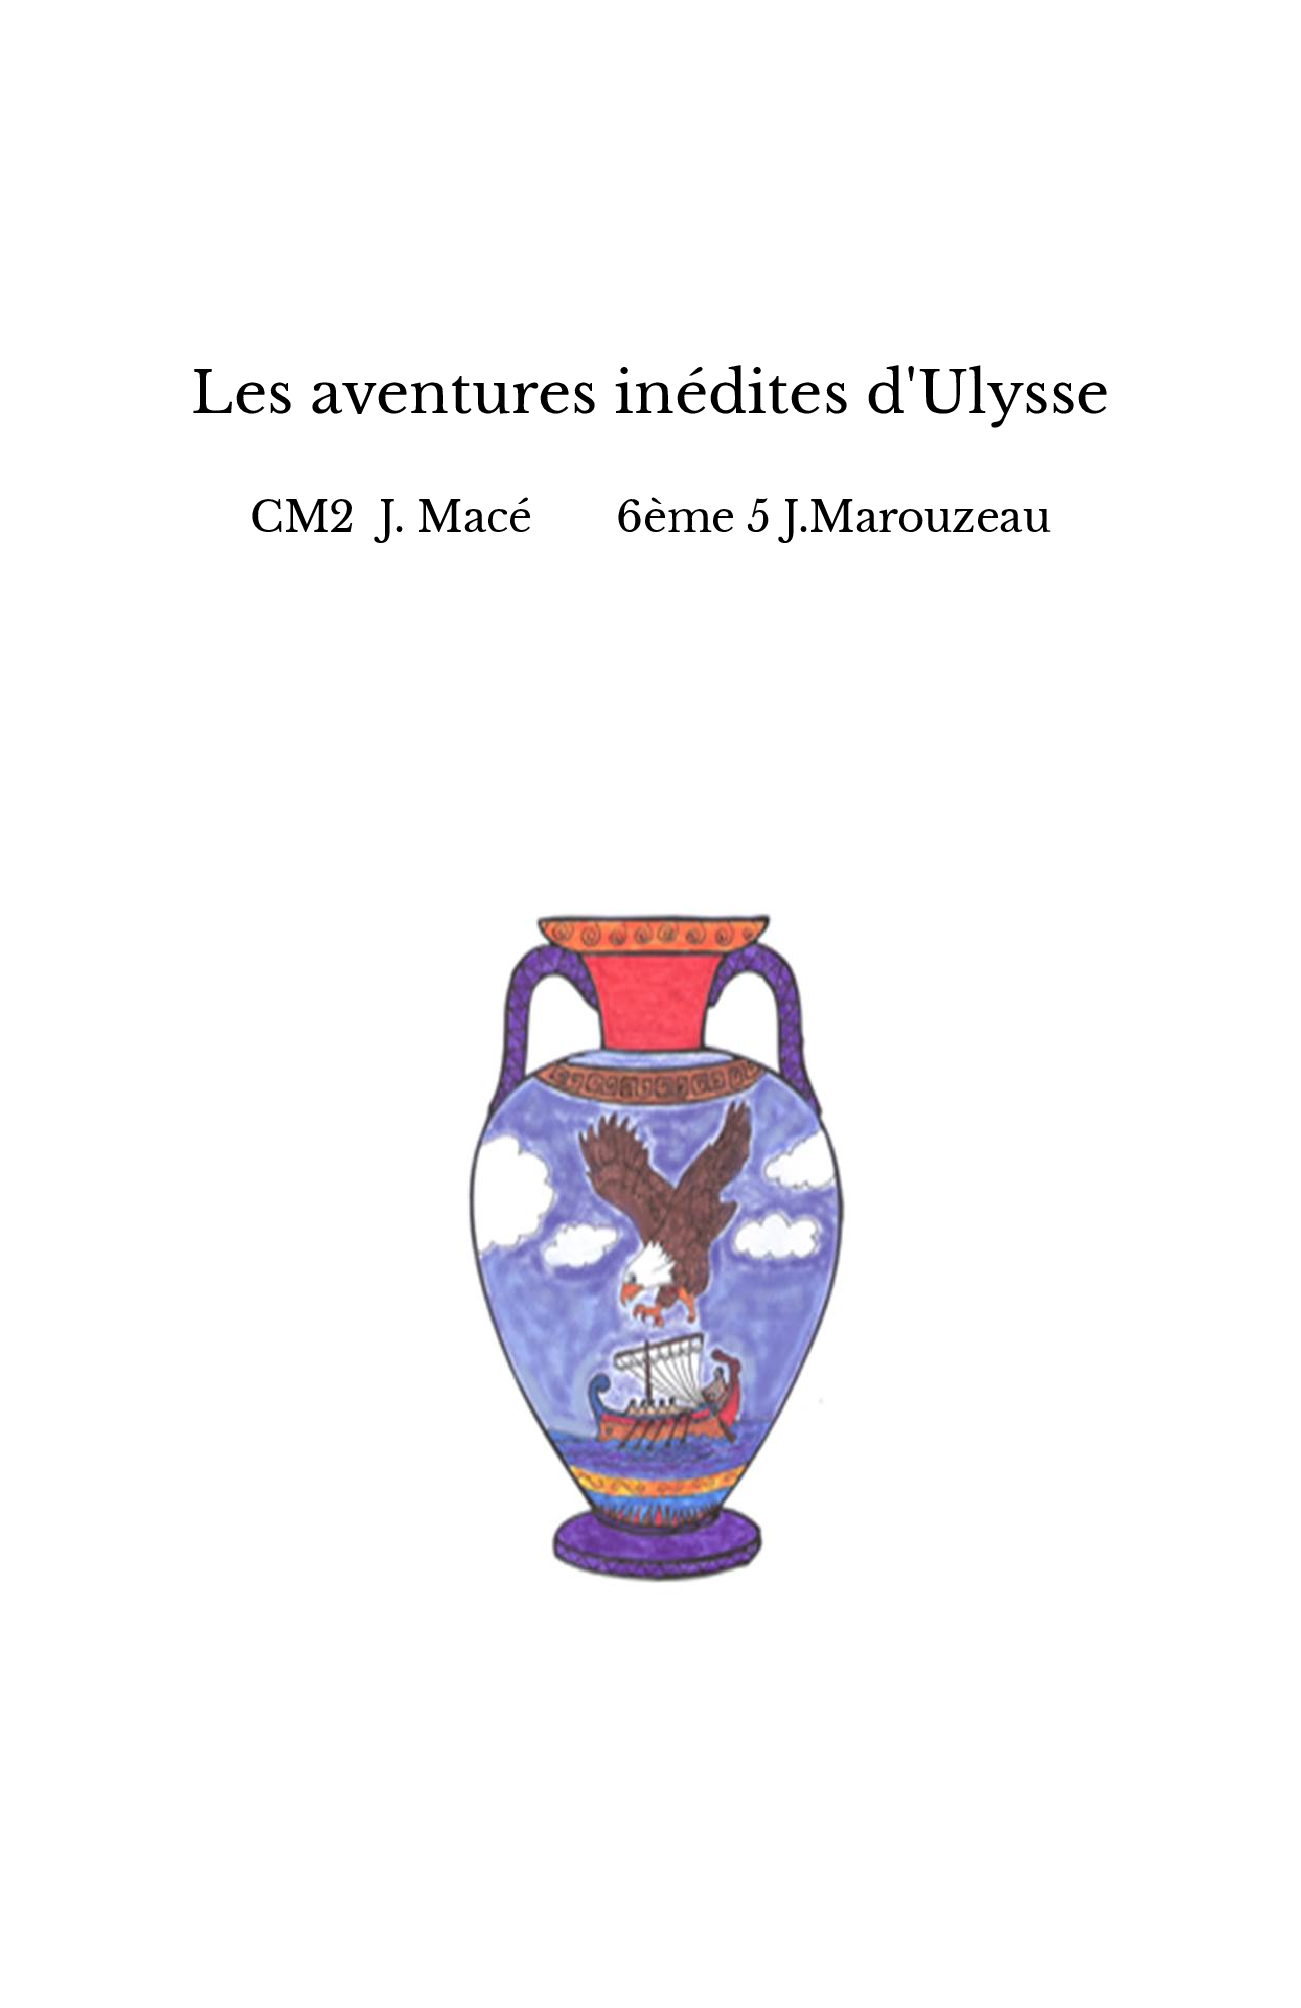 Les aventures inédites d'Ulysse